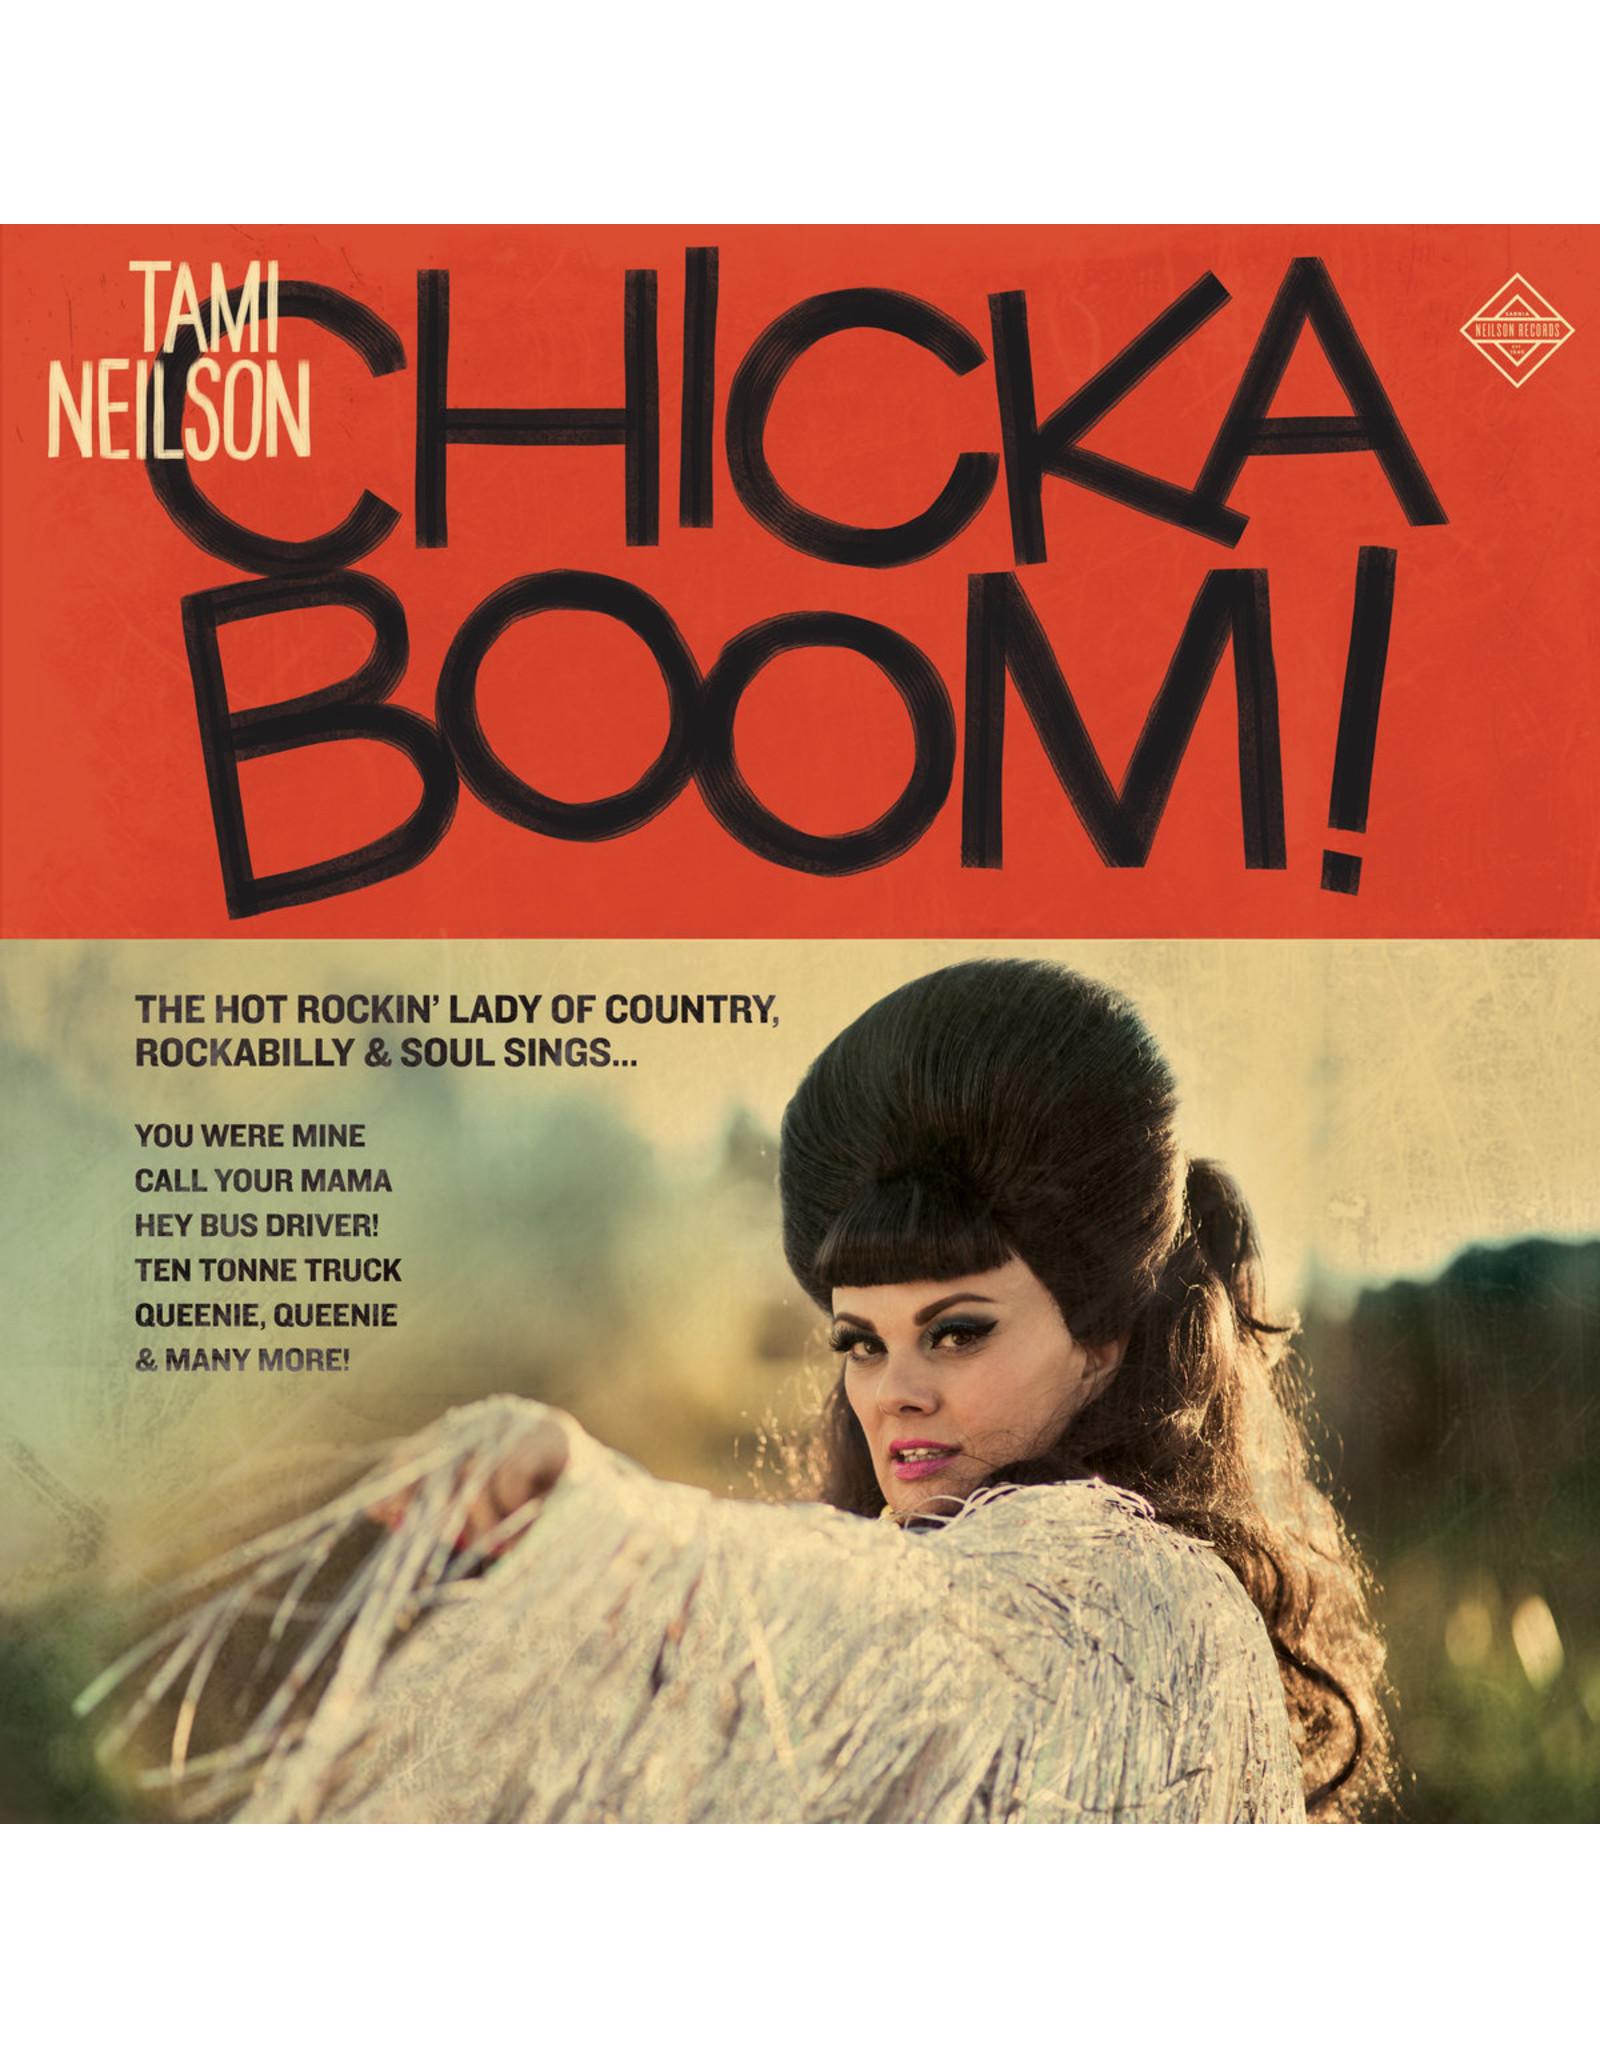 Tami Neilson - Chickaboom! LP